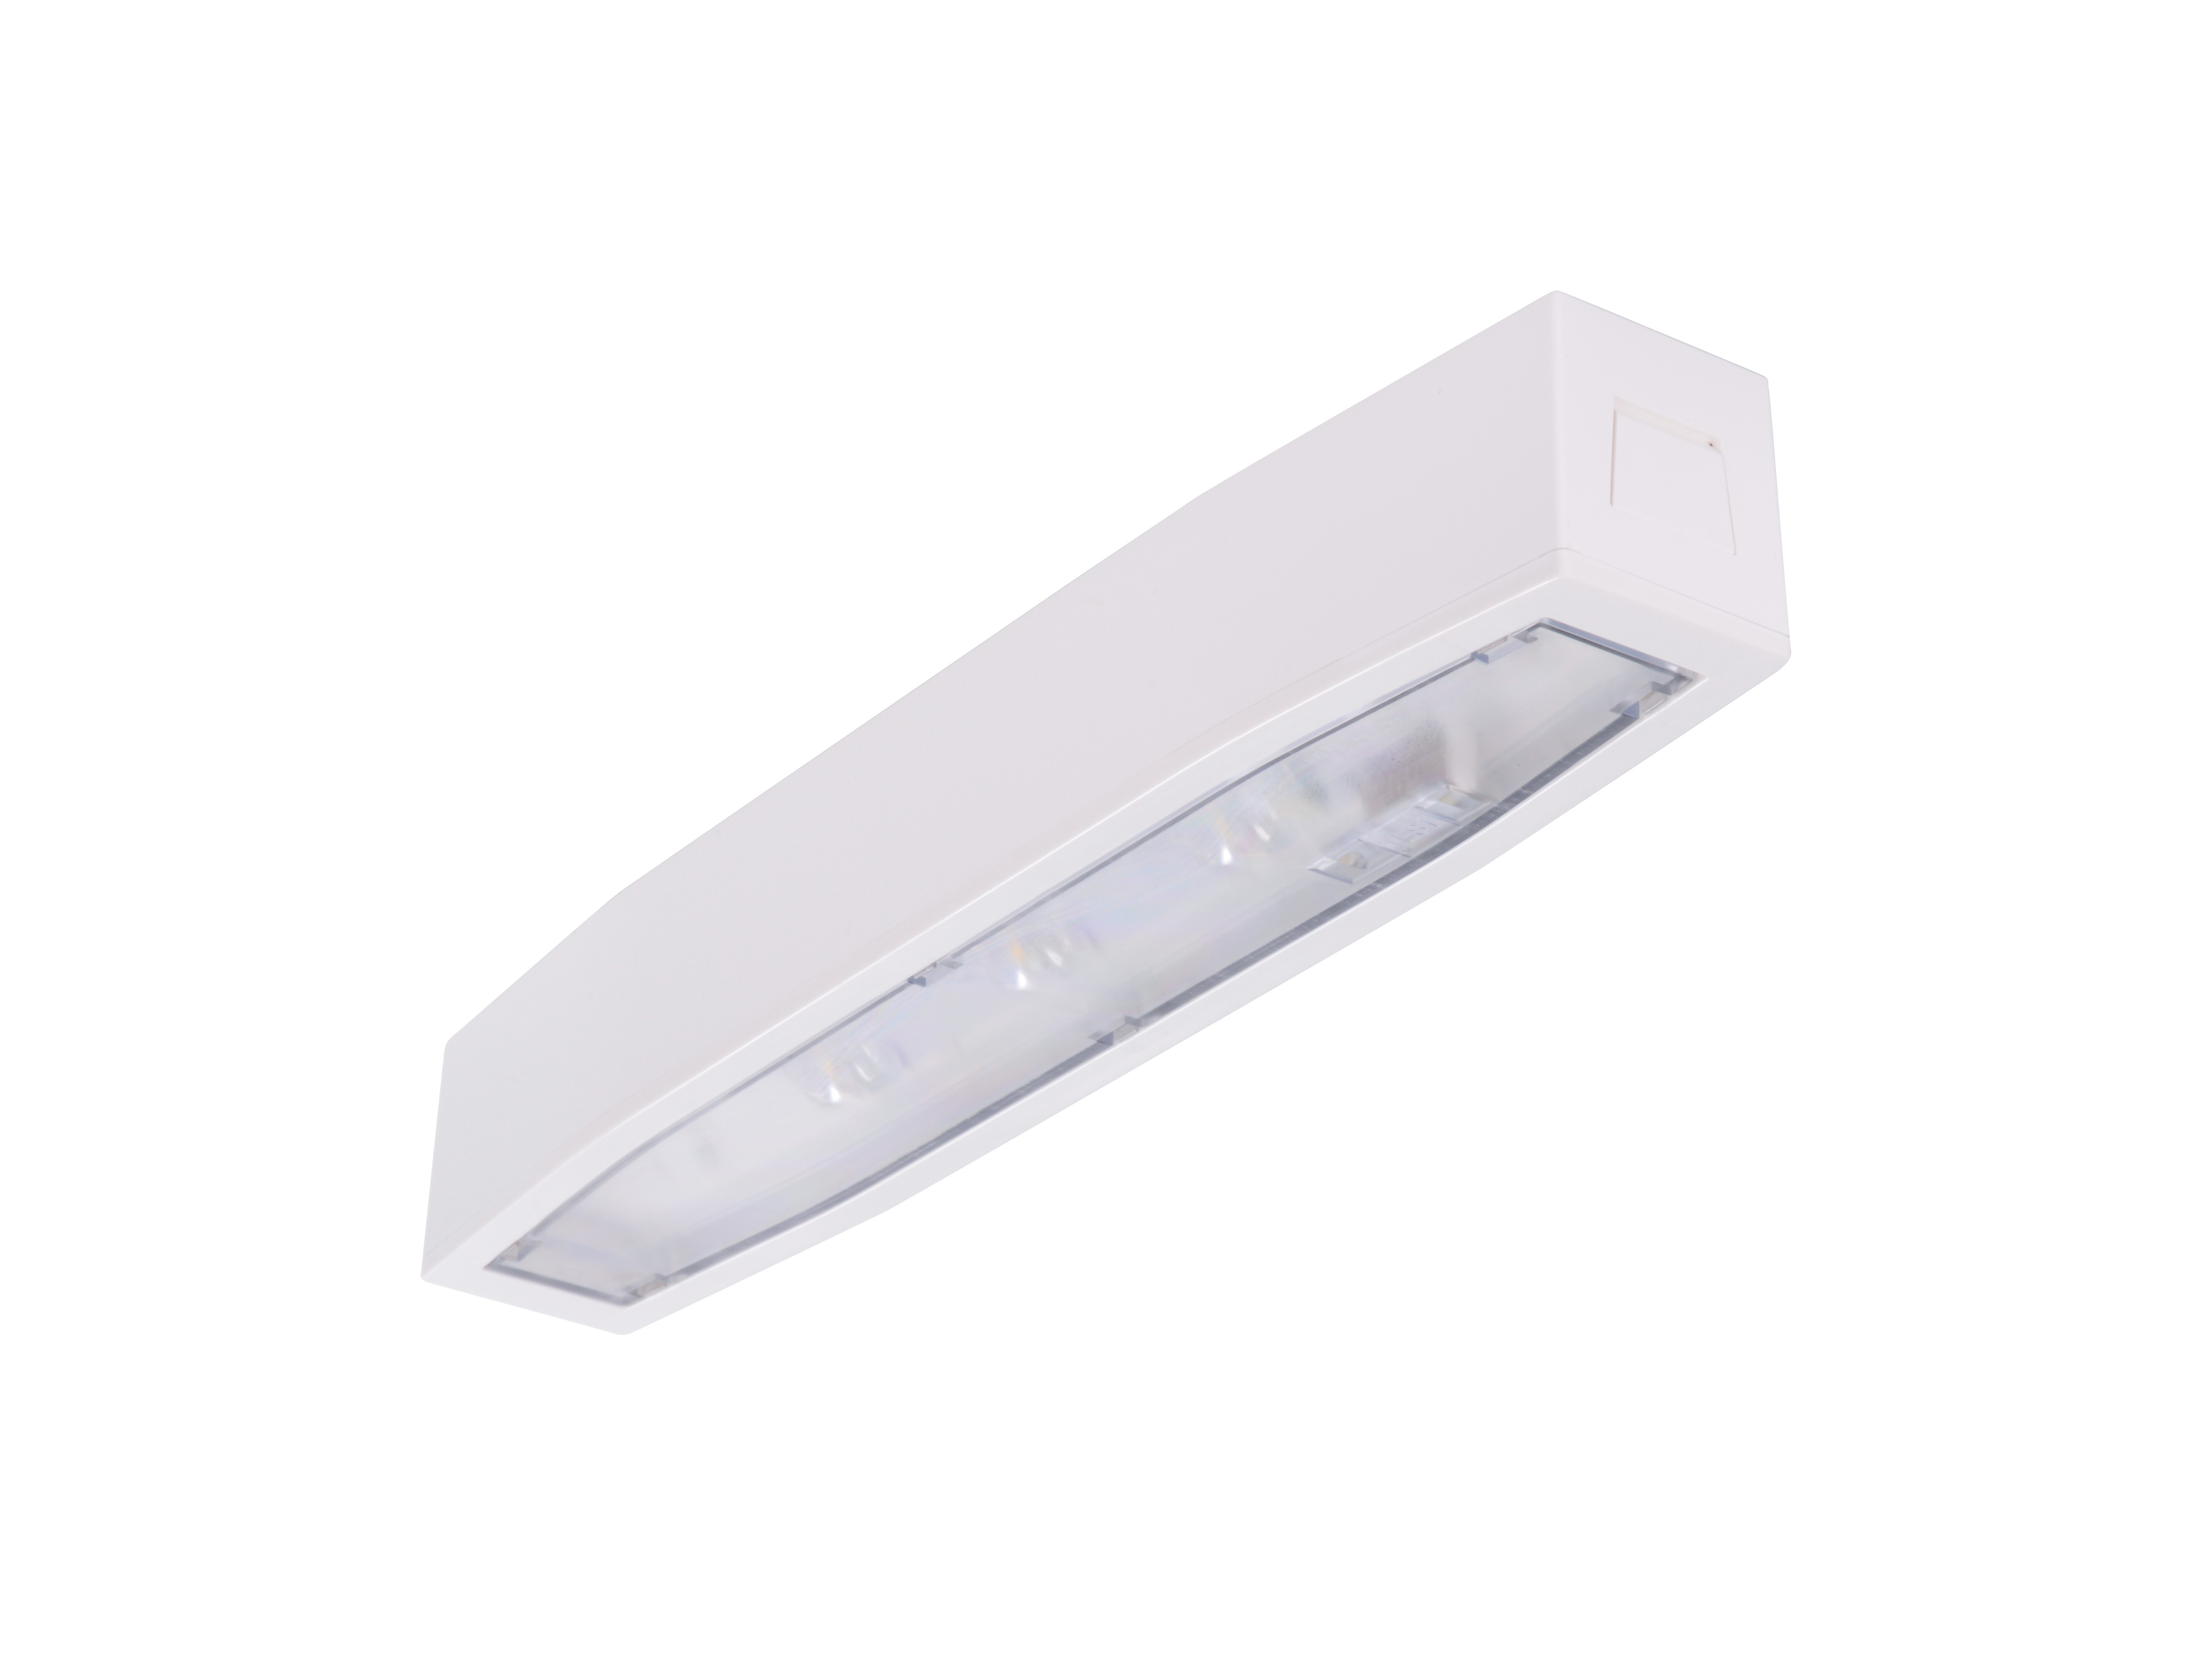 Lampa emergenta led Intelight 94658   3h mentinut test automat 0